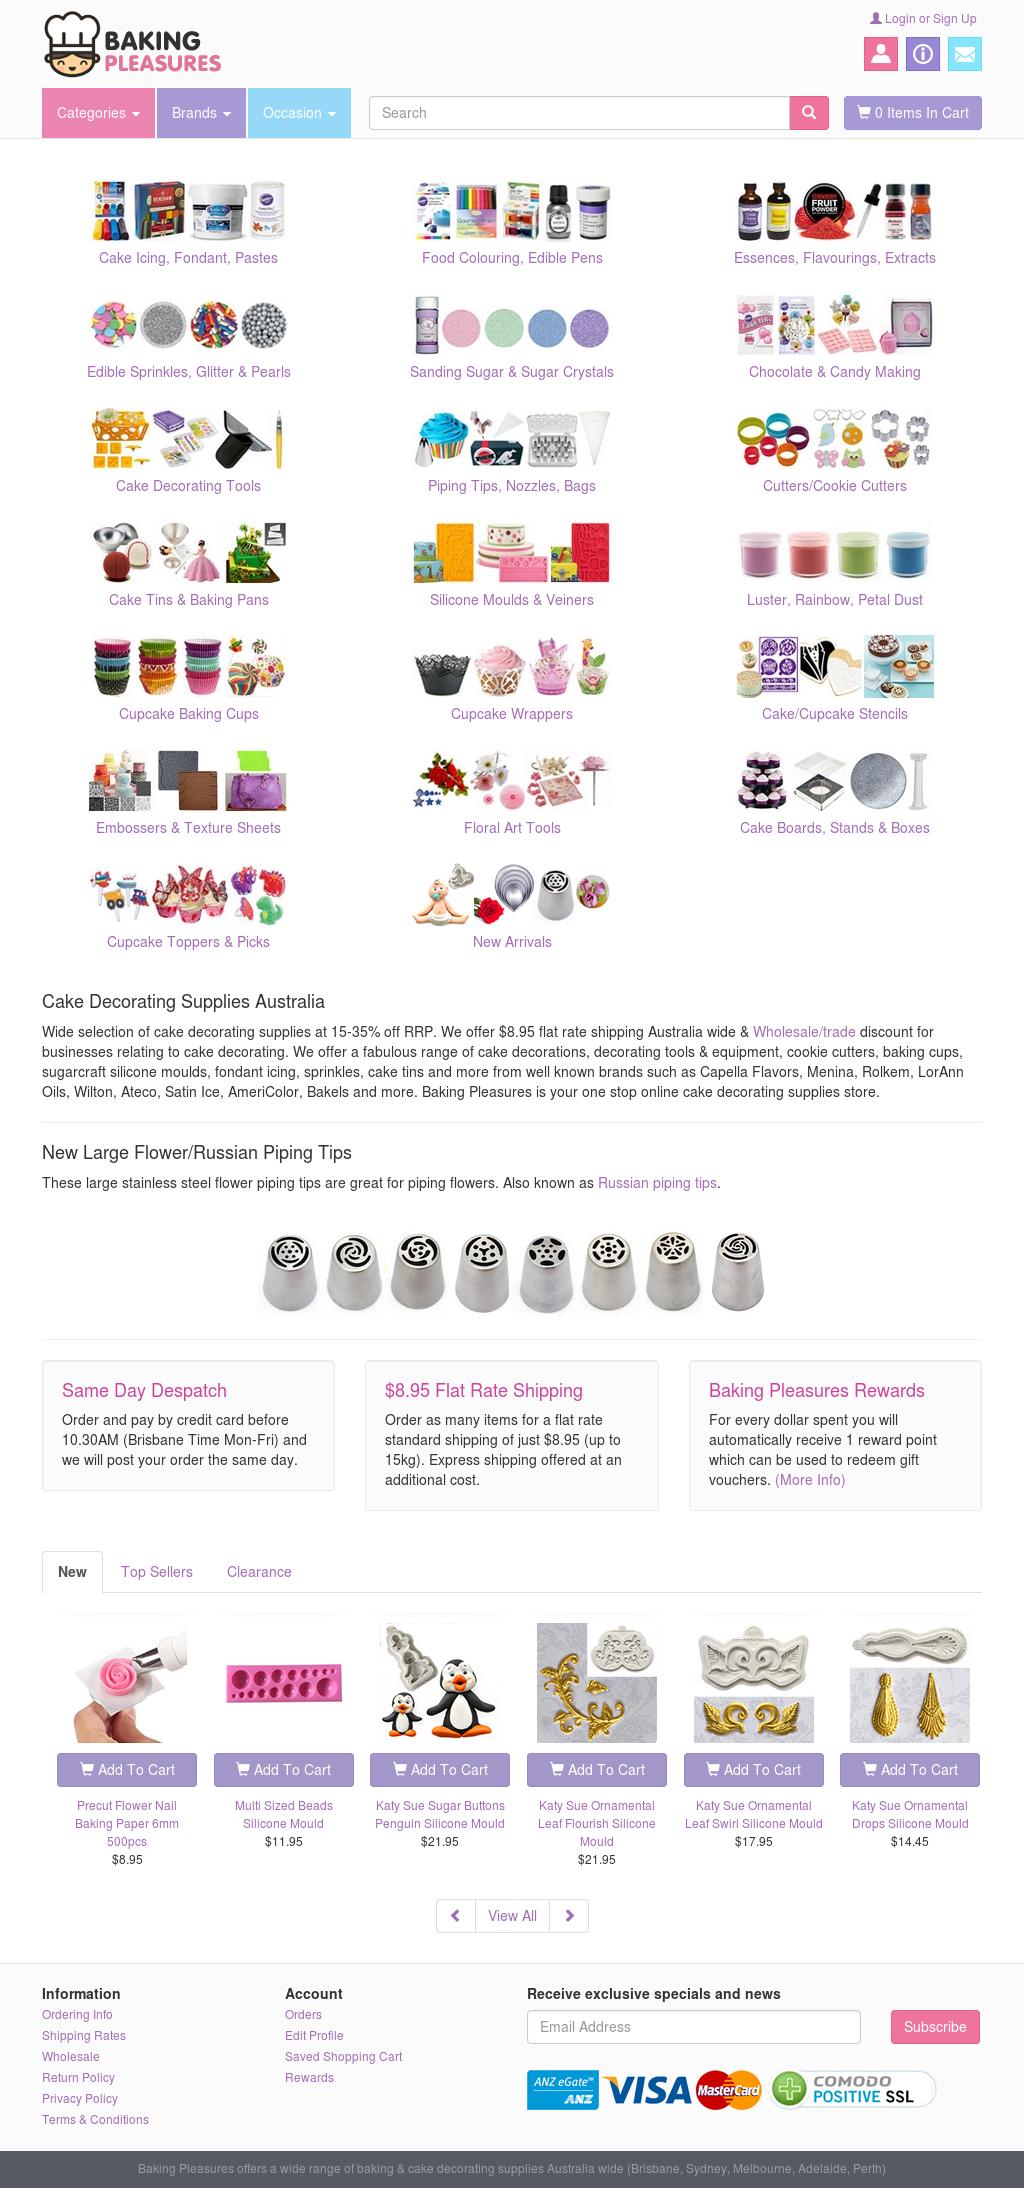 Bakingpleasures - Baking Supplies And Cake Decorating